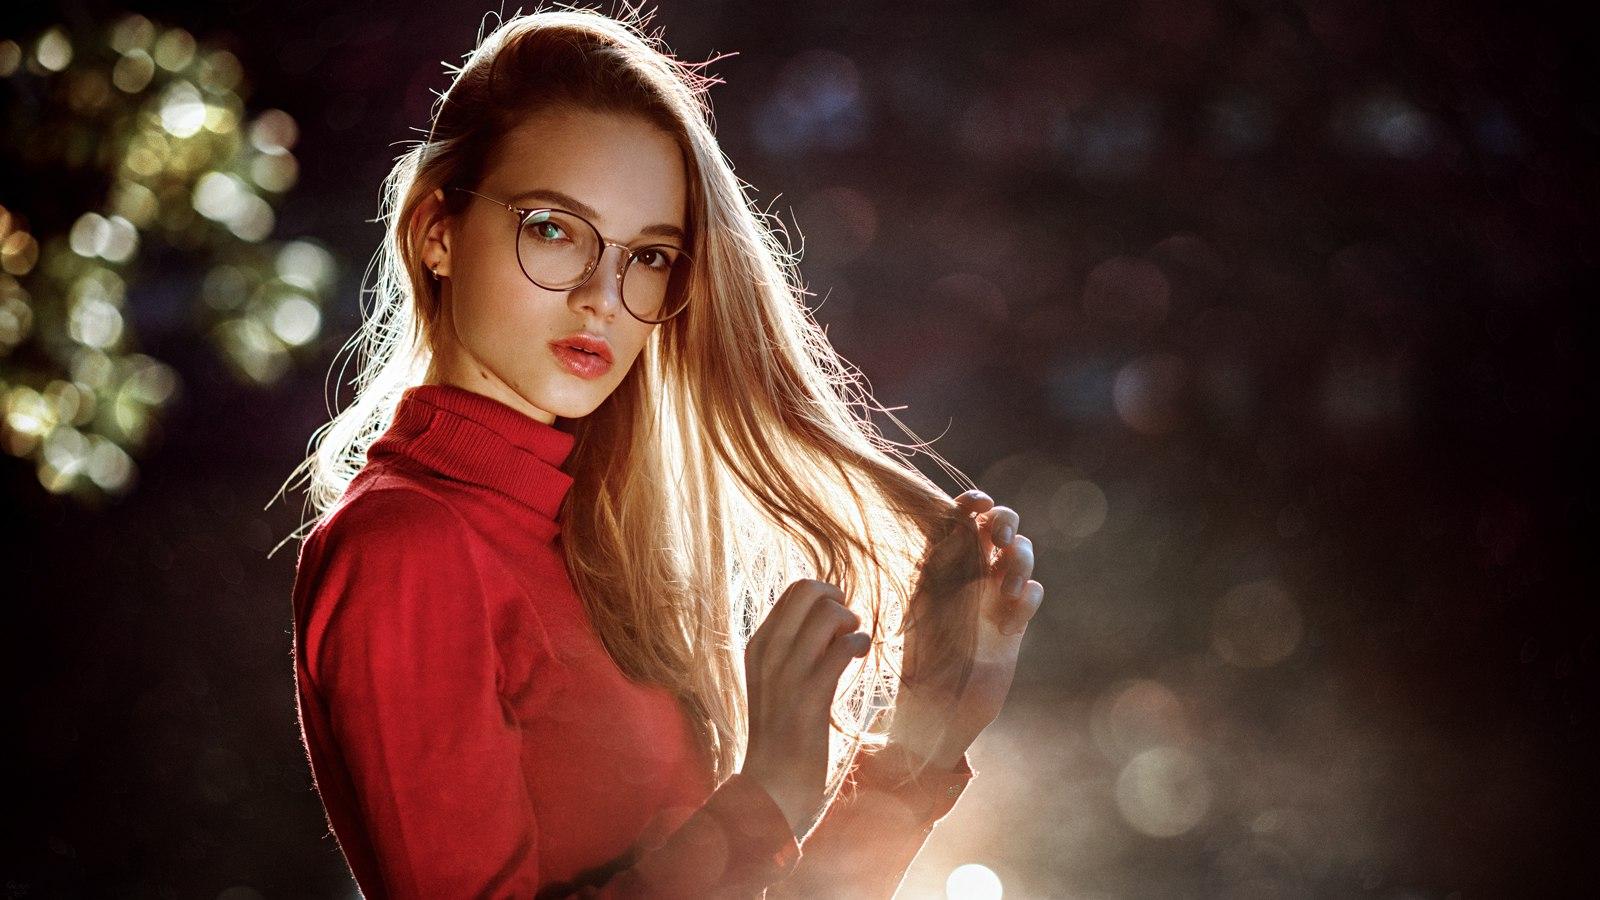 People 1600x900 red blonde women with glasses women Anna Dyuzhina Georgy Chernyadyev portrait sunlight holding hair juicy lips pink lipstick depth of field blurred bokeh